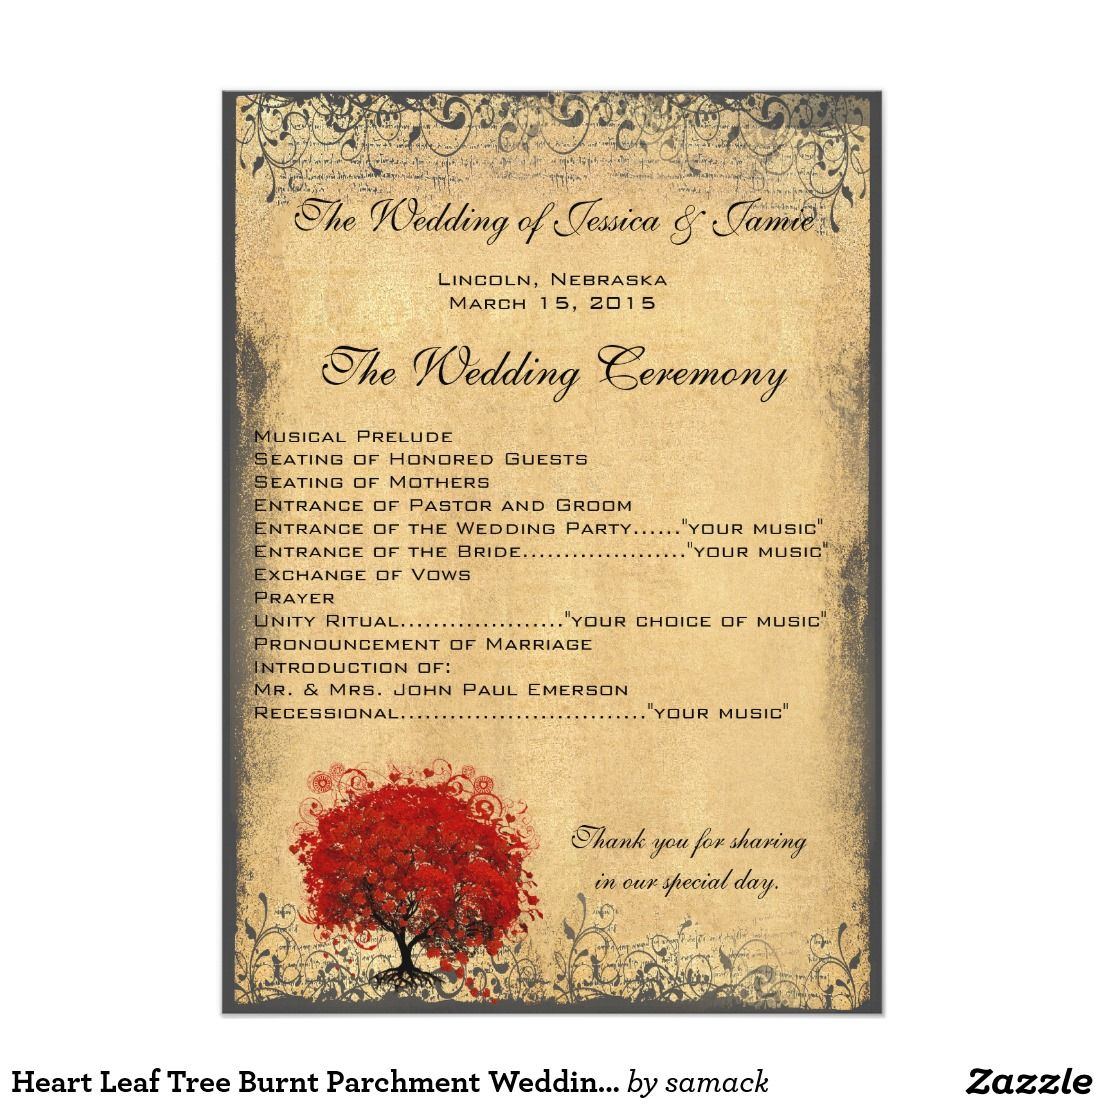 Heart Leaf Tree Burnt Parchment Wedding Program Wedding Programs